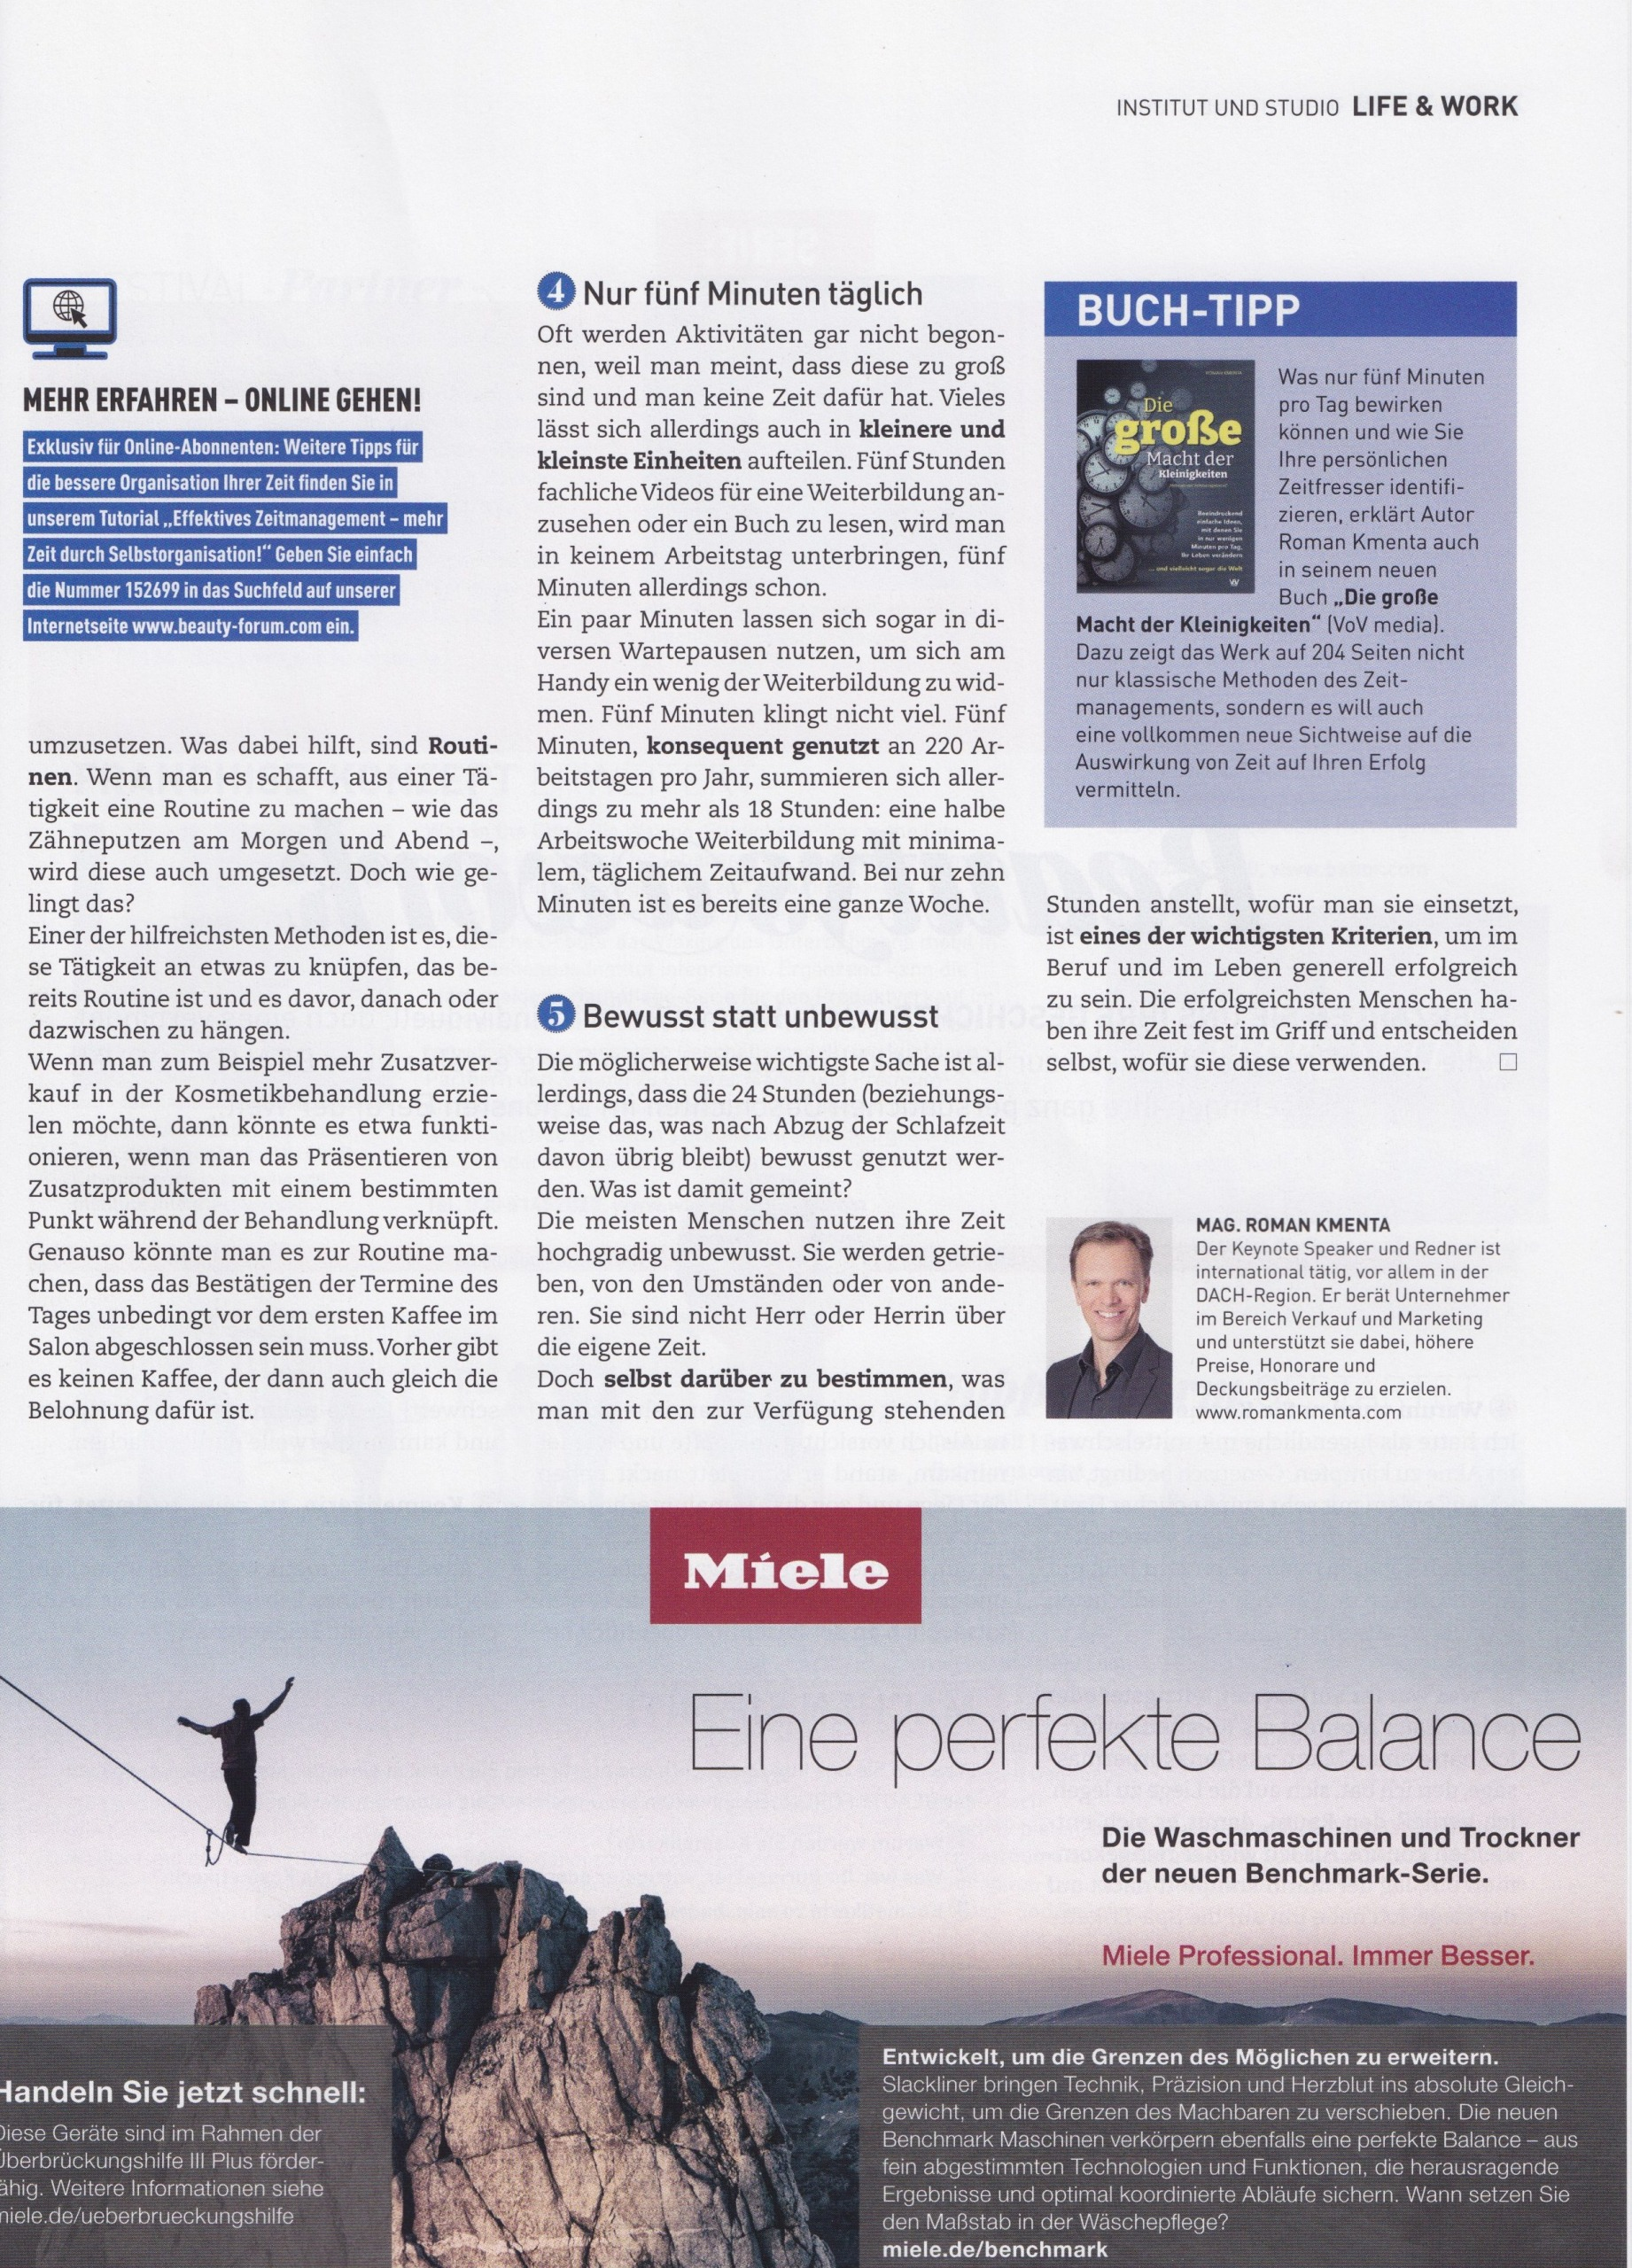 Beauty Forum 05-21 - Zeitmanagement - 2 - Mag. Roman Kmenta